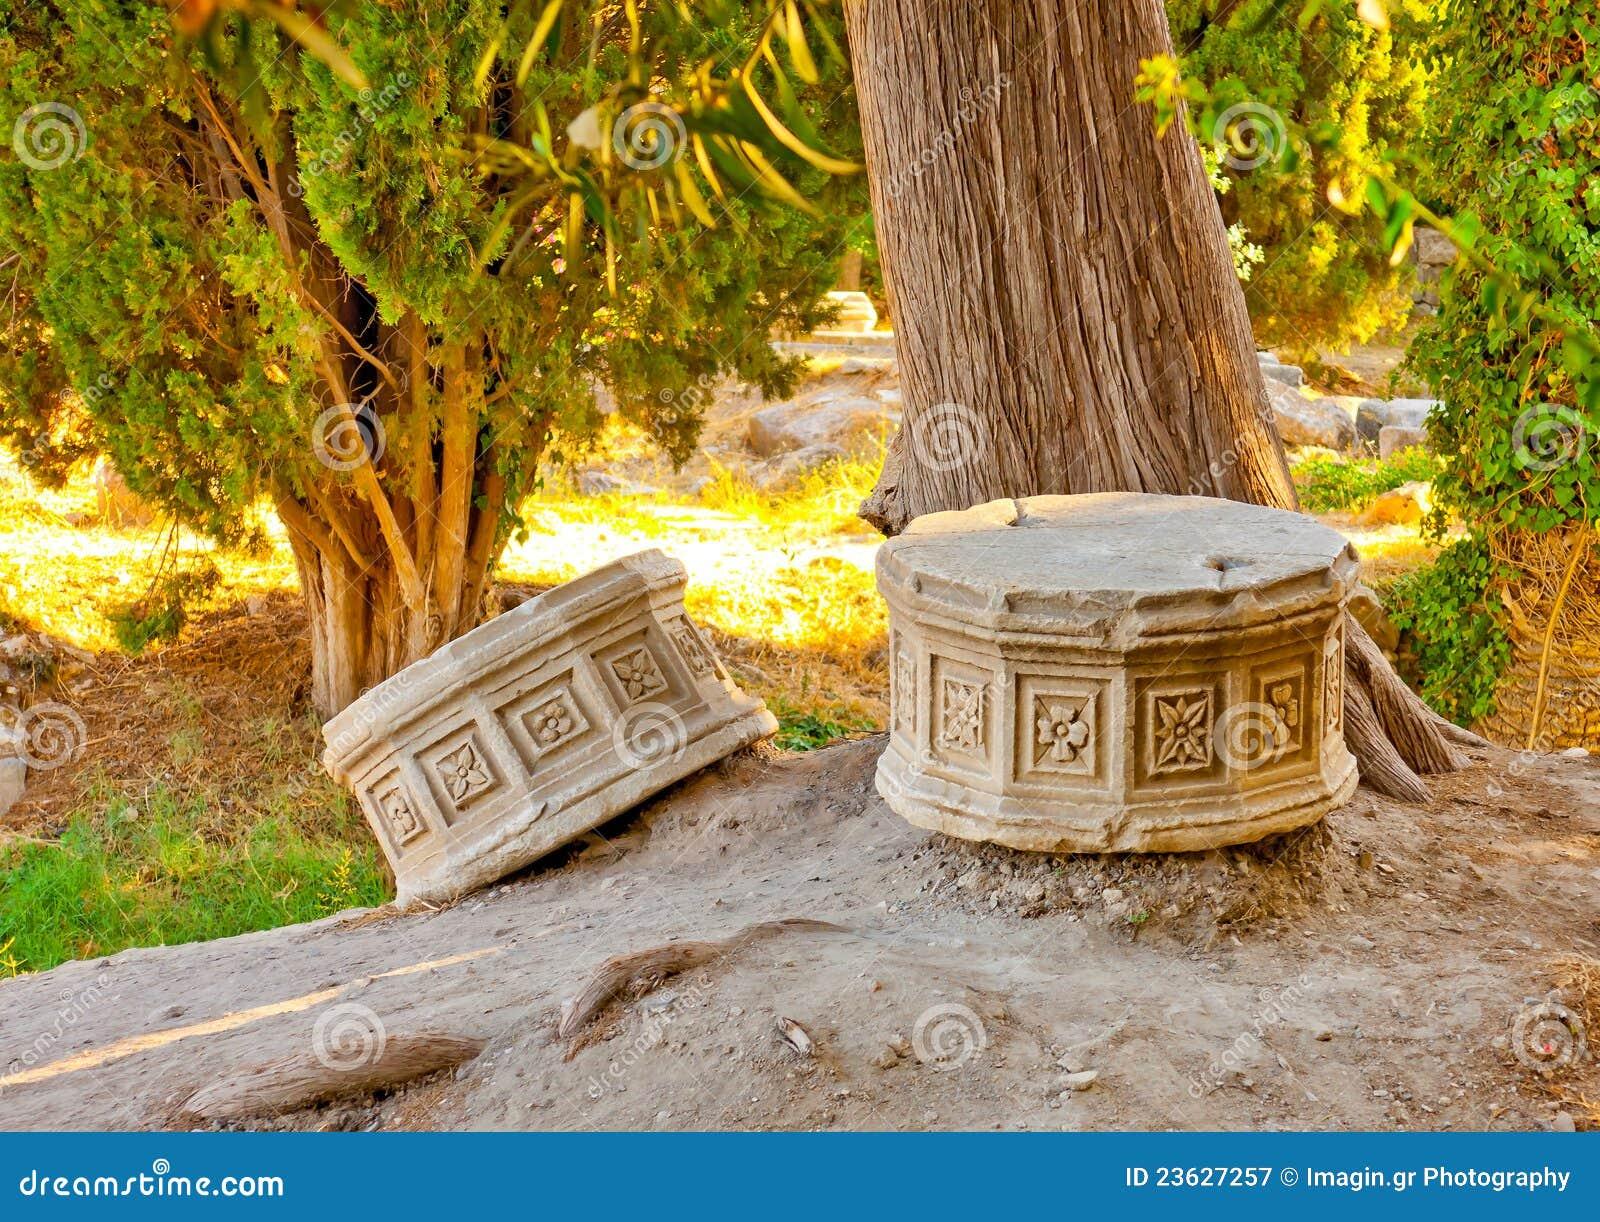 Marble Temple Home Decoration Ancient Roman Flower Relief Stock Photo Cartoondealer